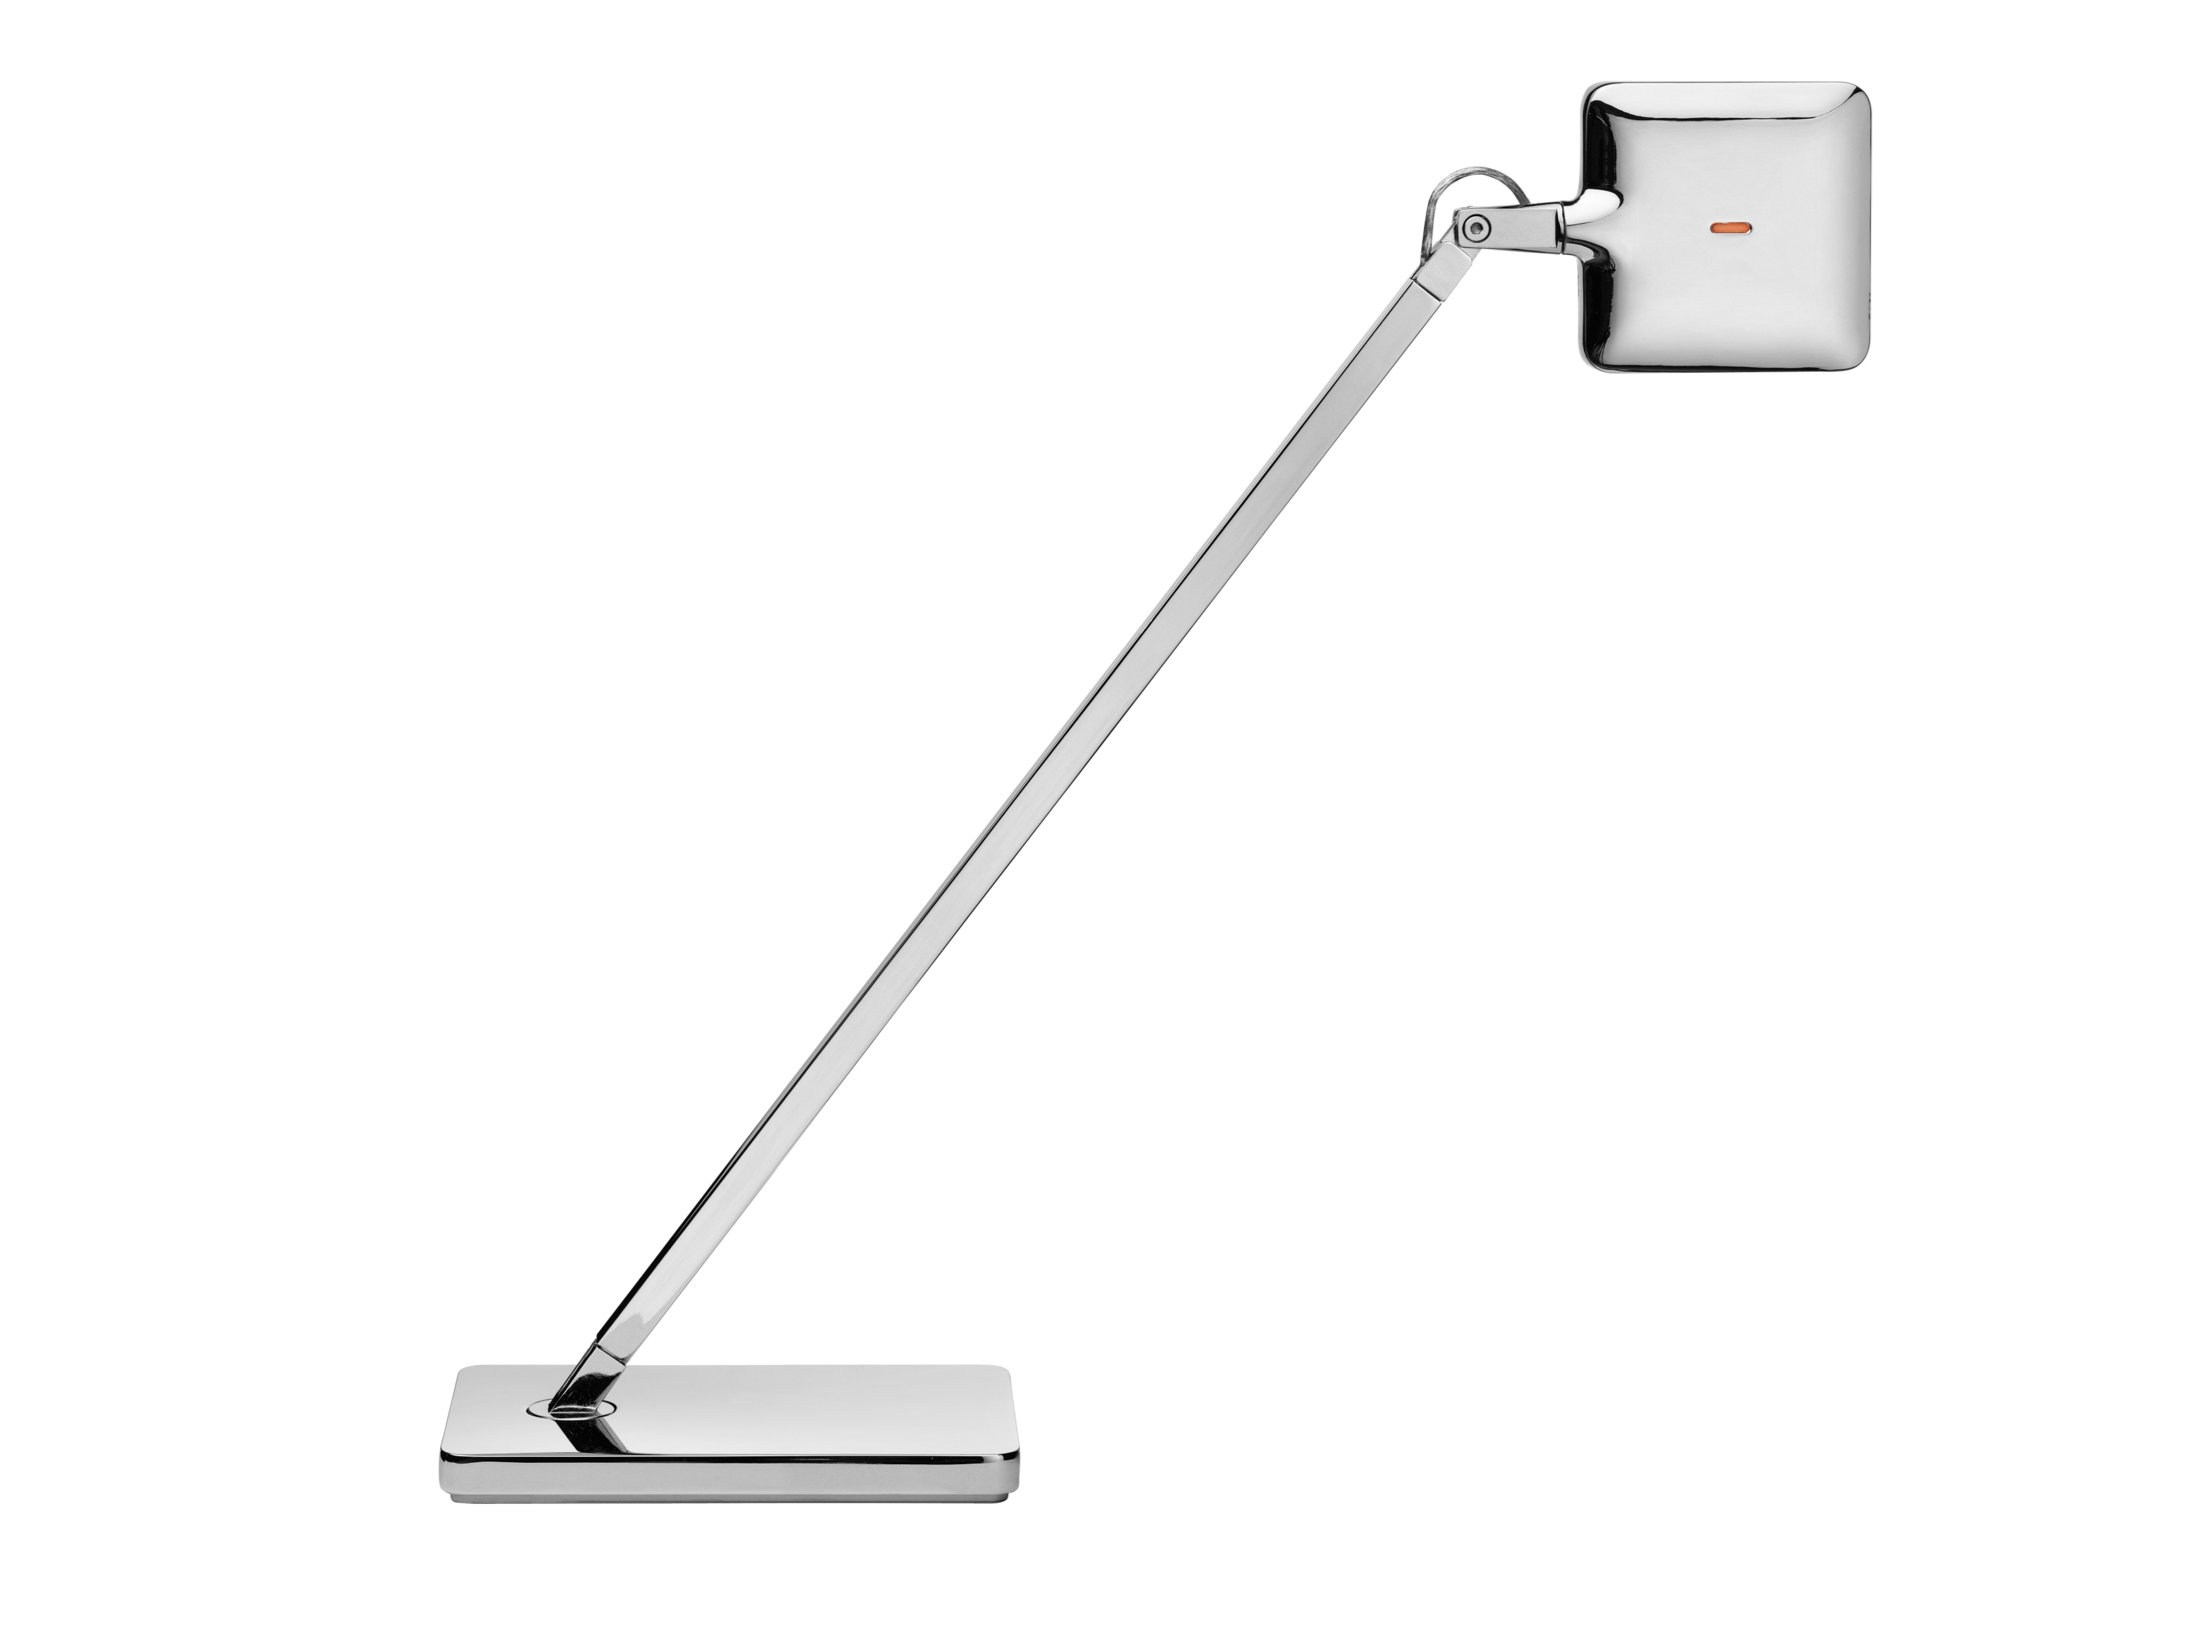 adjustable table lamp mini kelvin led by flos design. Black Bedroom Furniture Sets. Home Design Ideas